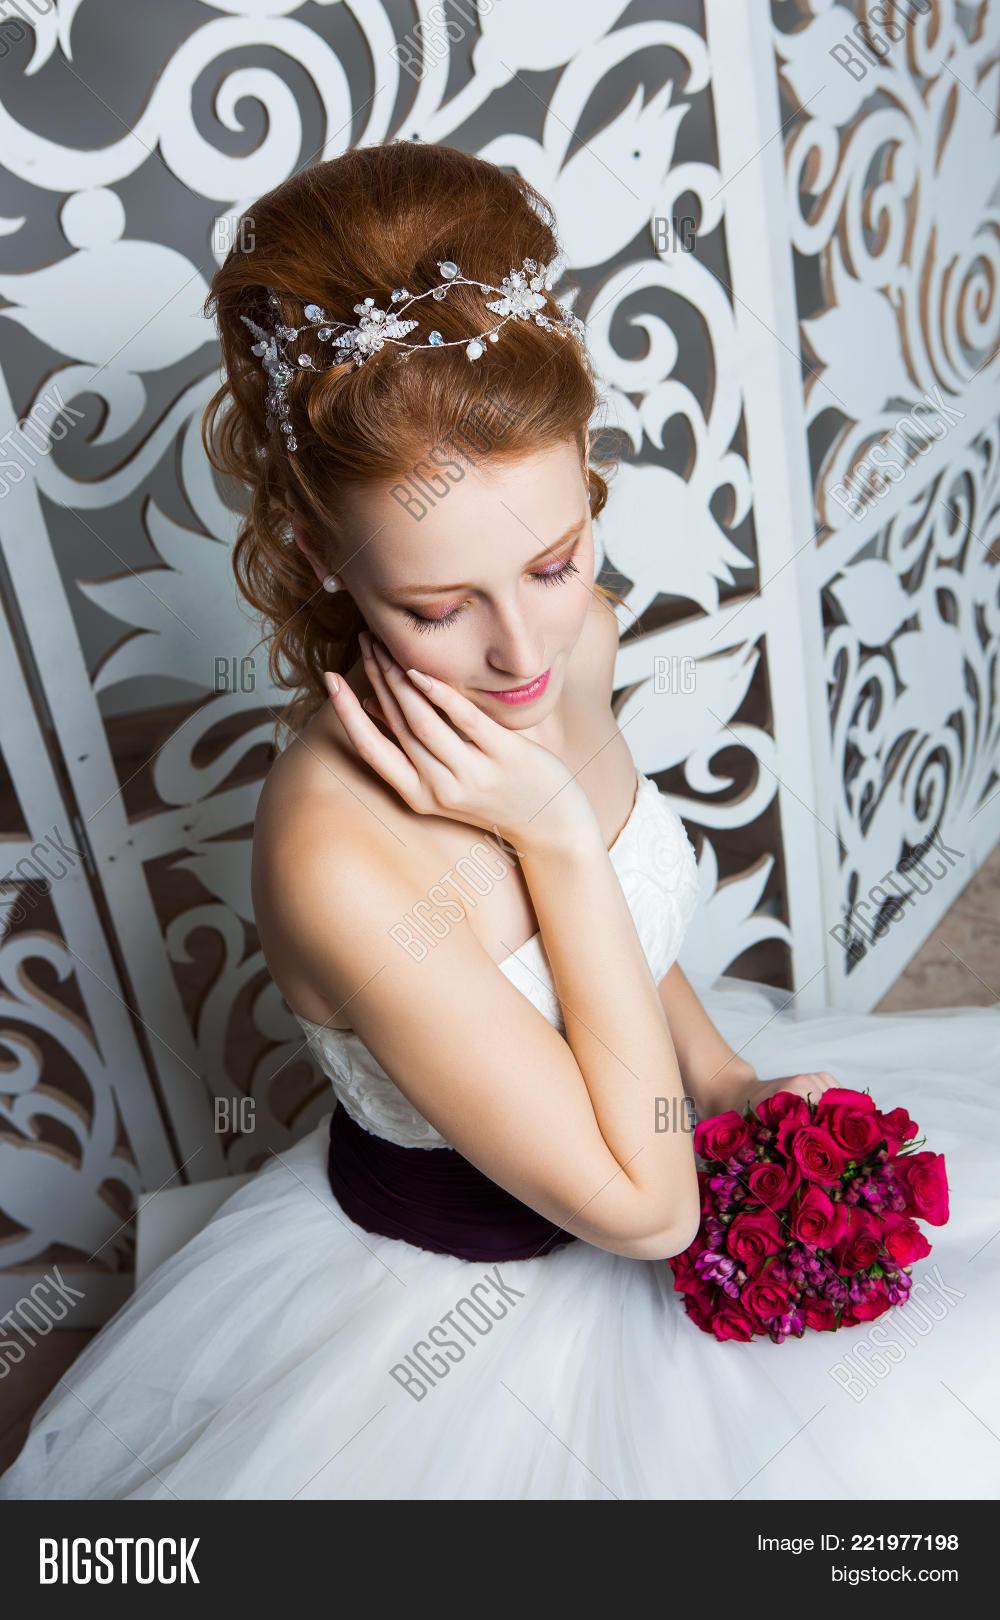 Beautiful Red Hair Image Photo Free Trial Bigstock